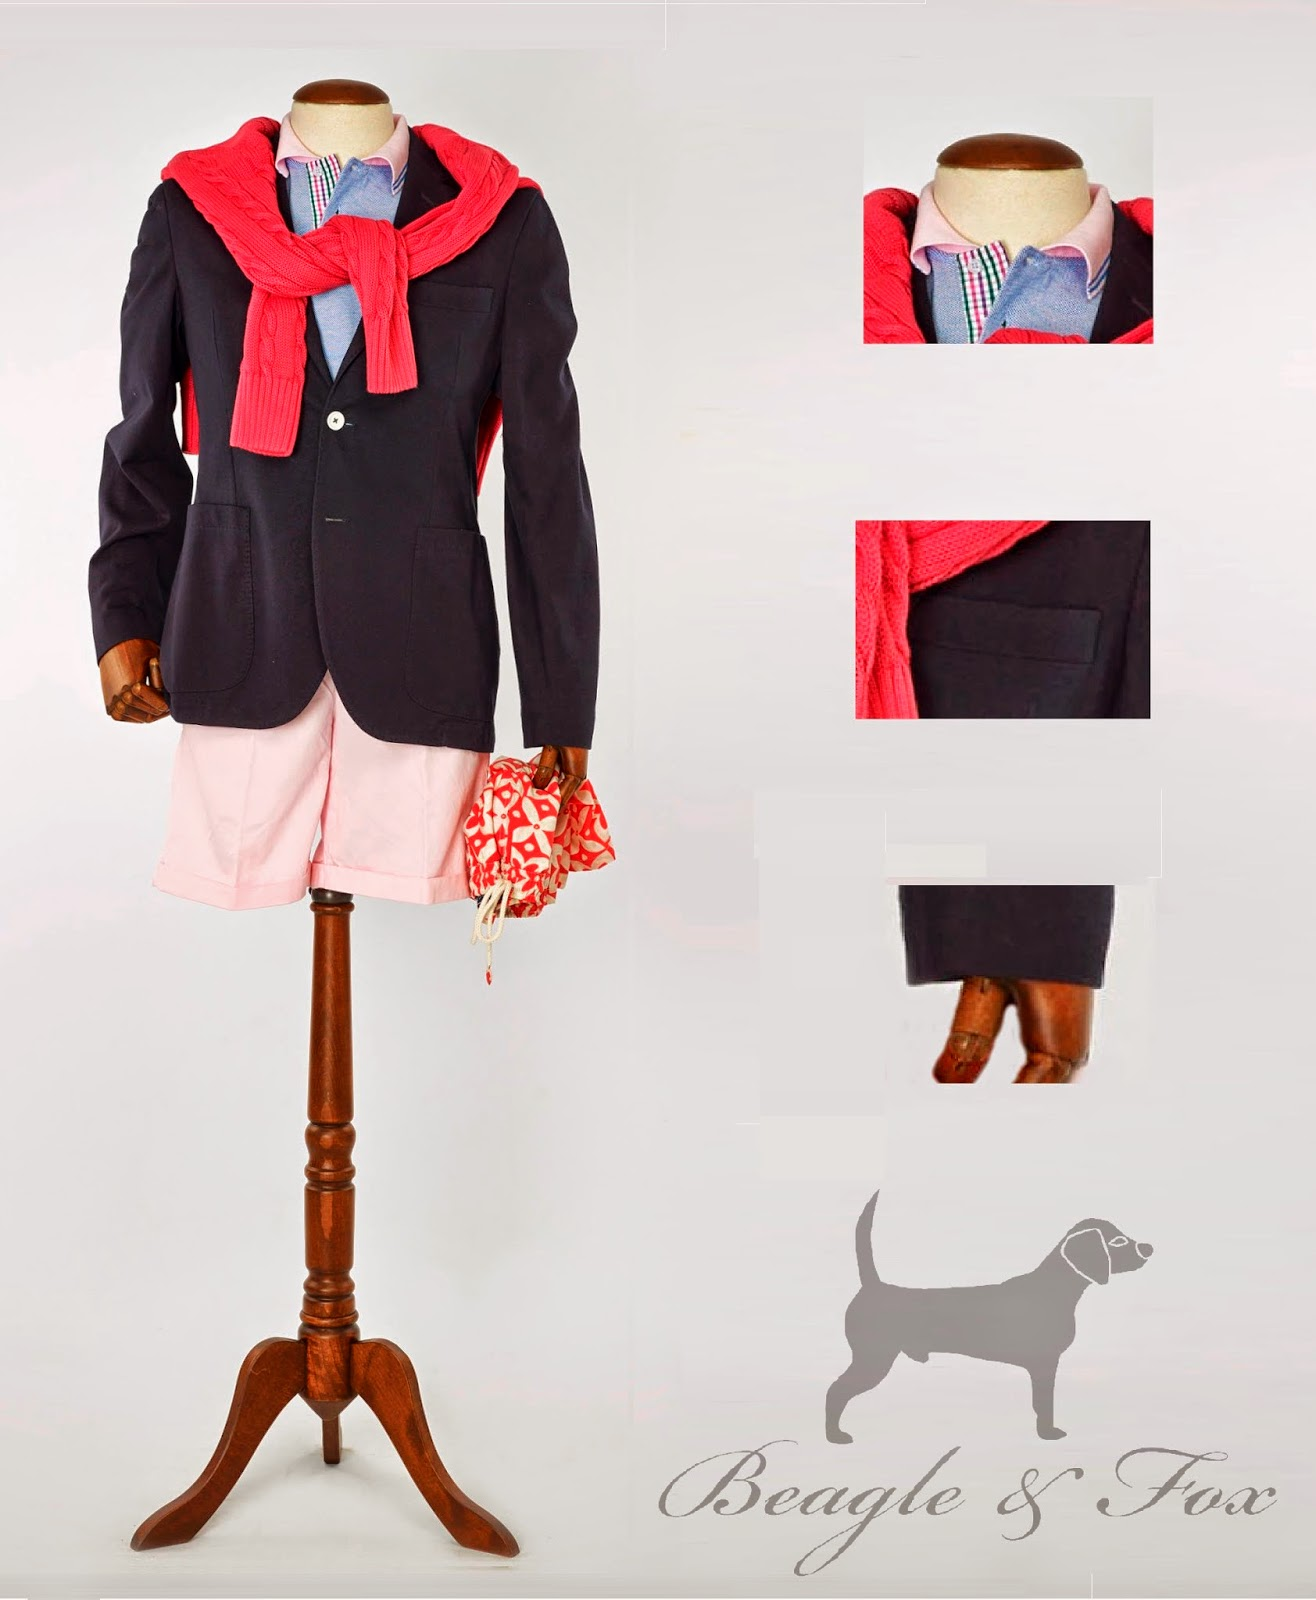 Spring 2014, primavera verano, 2014, Beagle and Fox, menswear, Made in Spain, moda hombre, moda española,